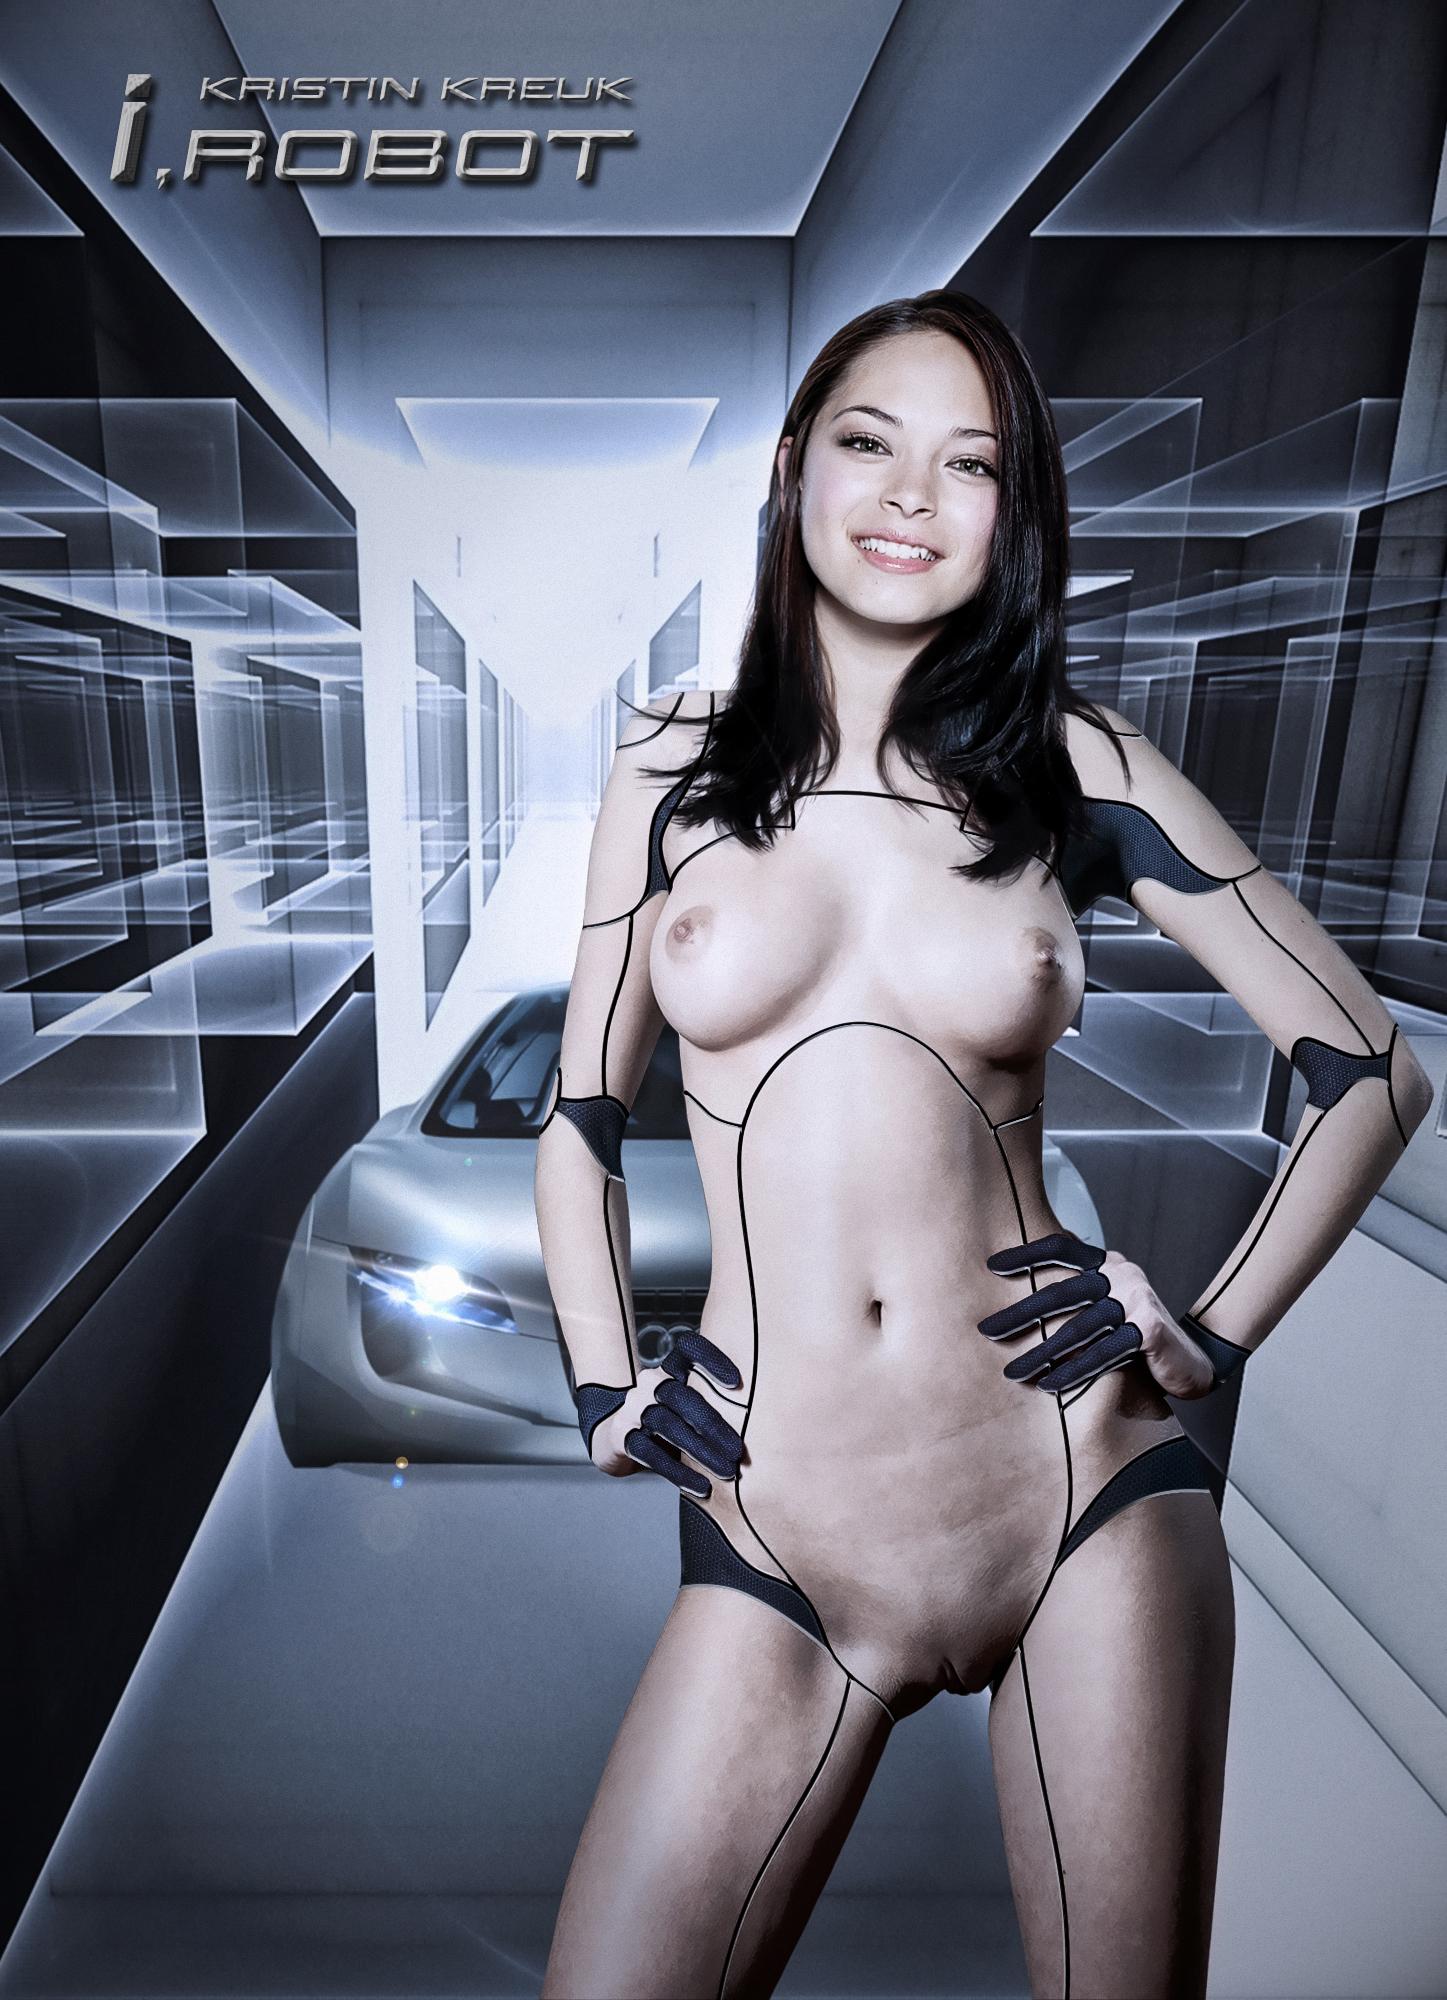 Kristin Kreuk Porn Deepfakes